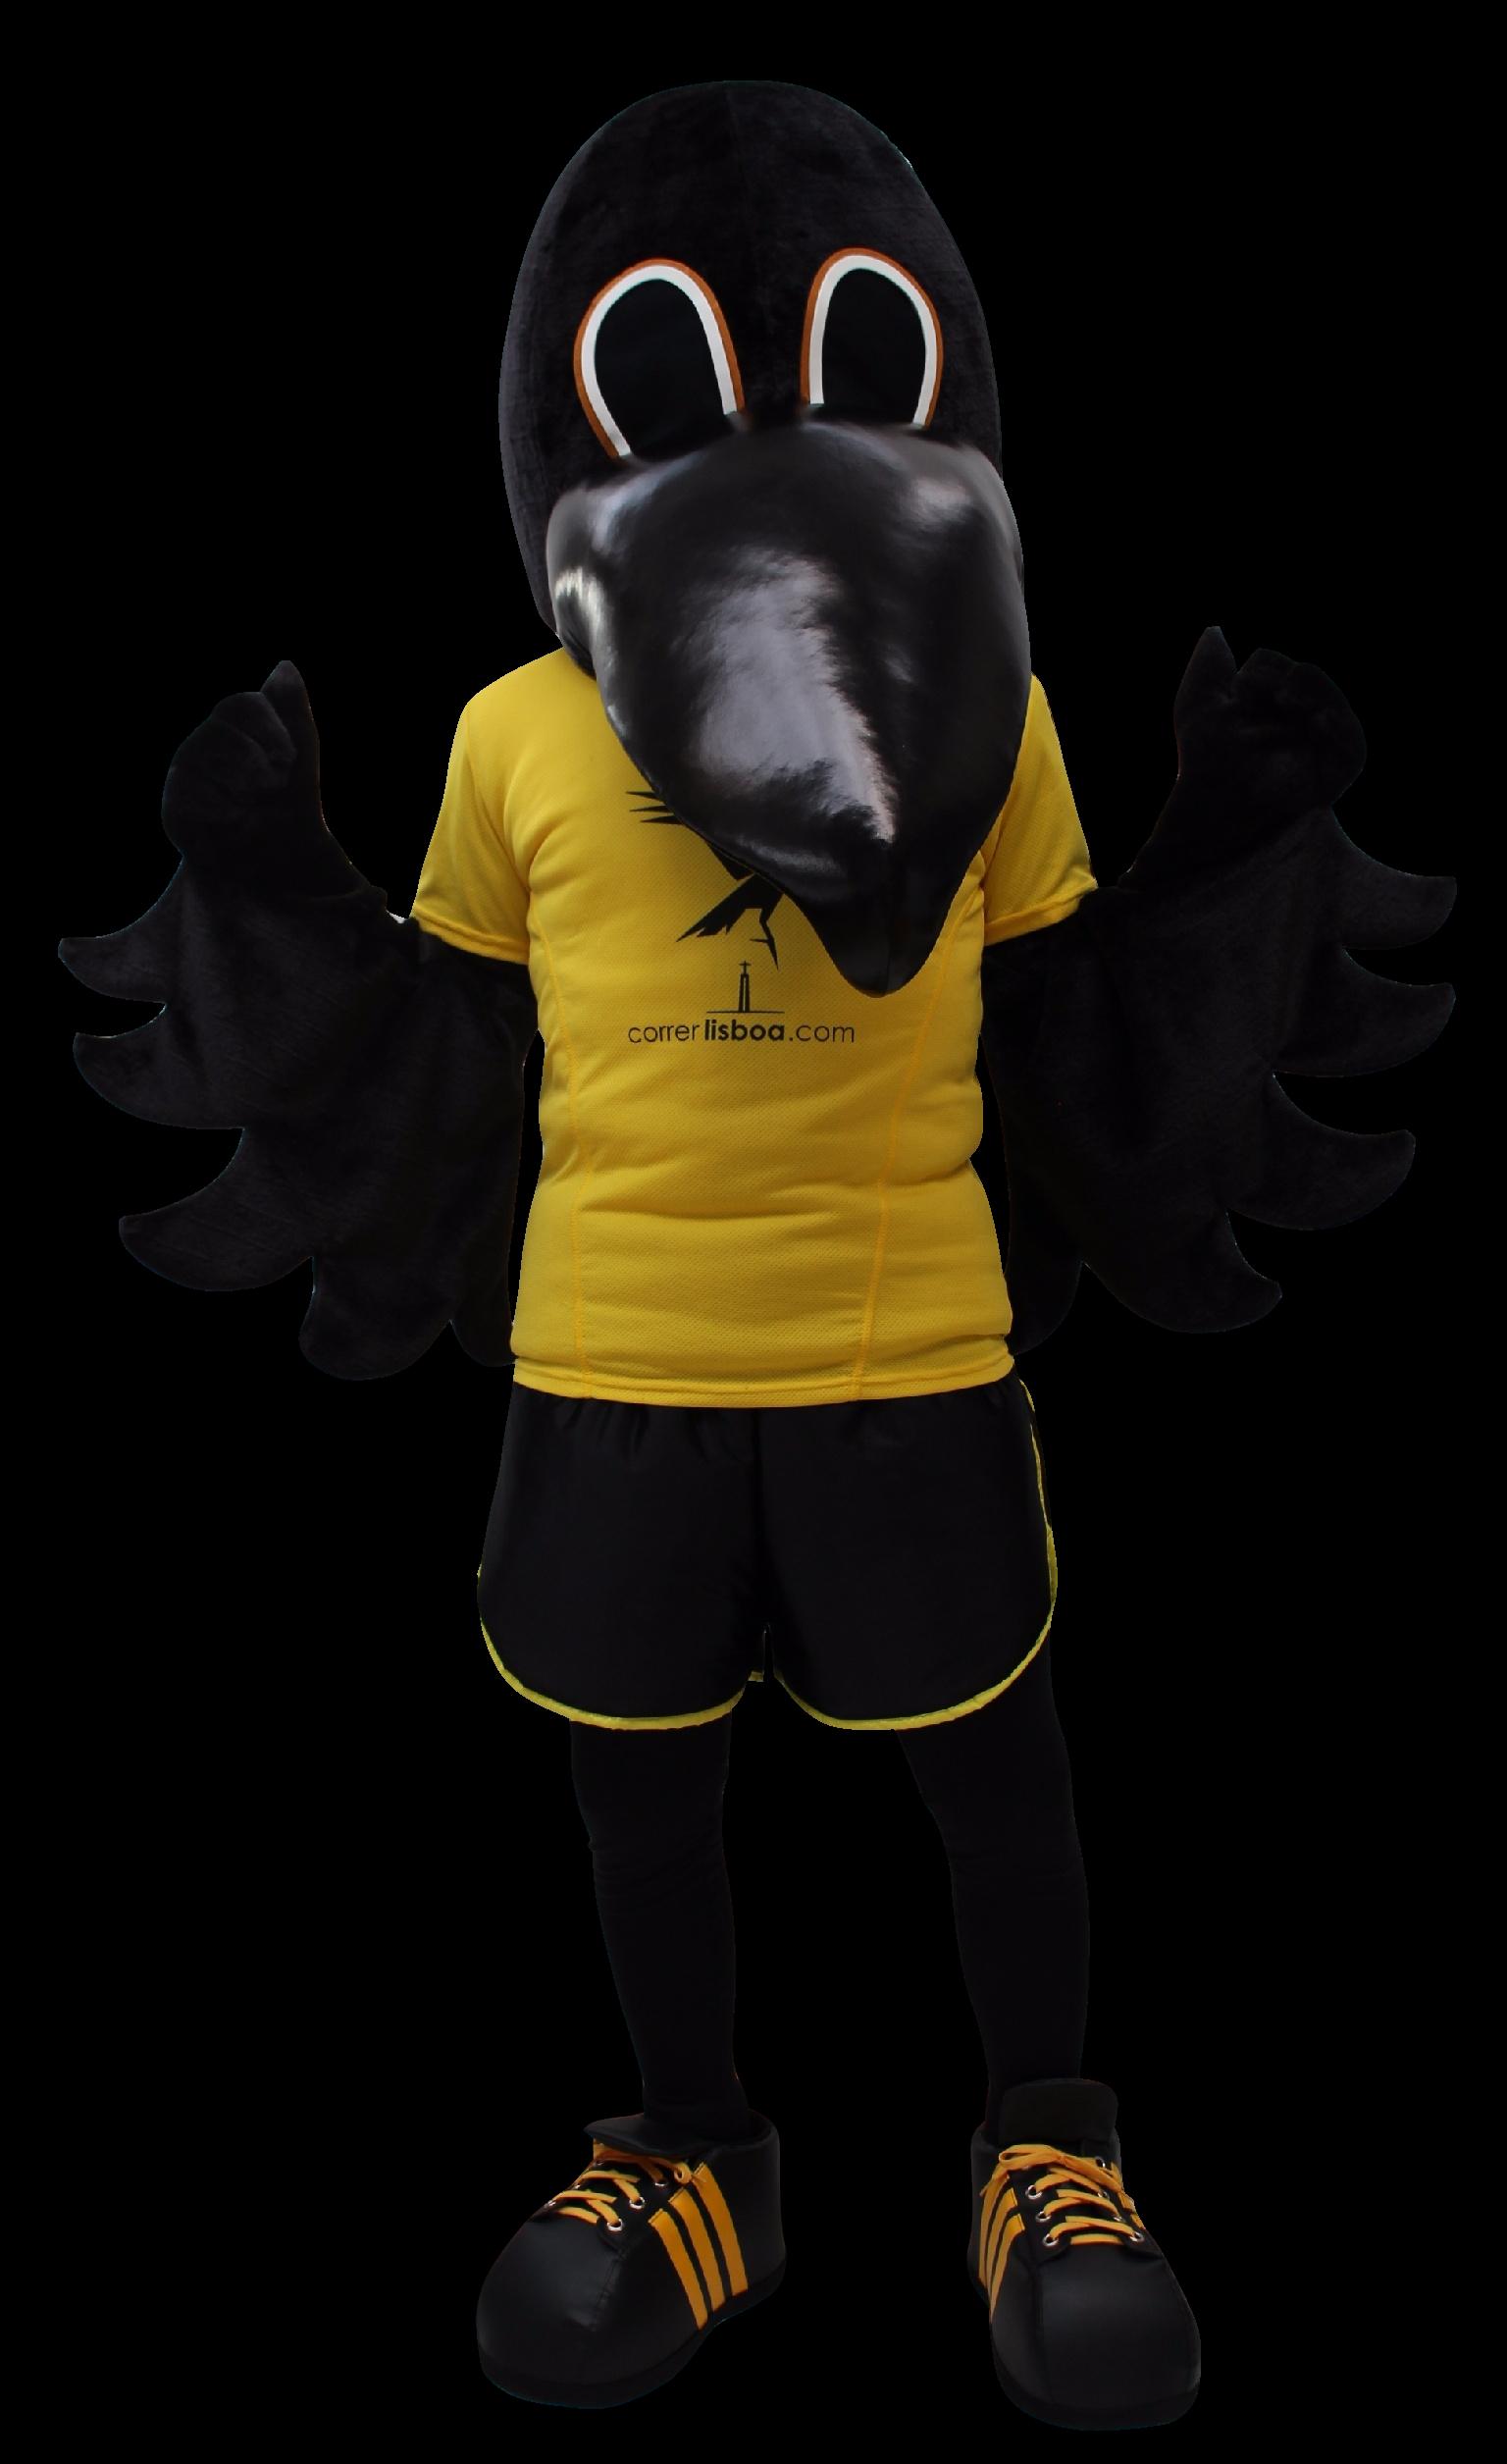 Mascote Partyval Corvo Correr Lisboa I